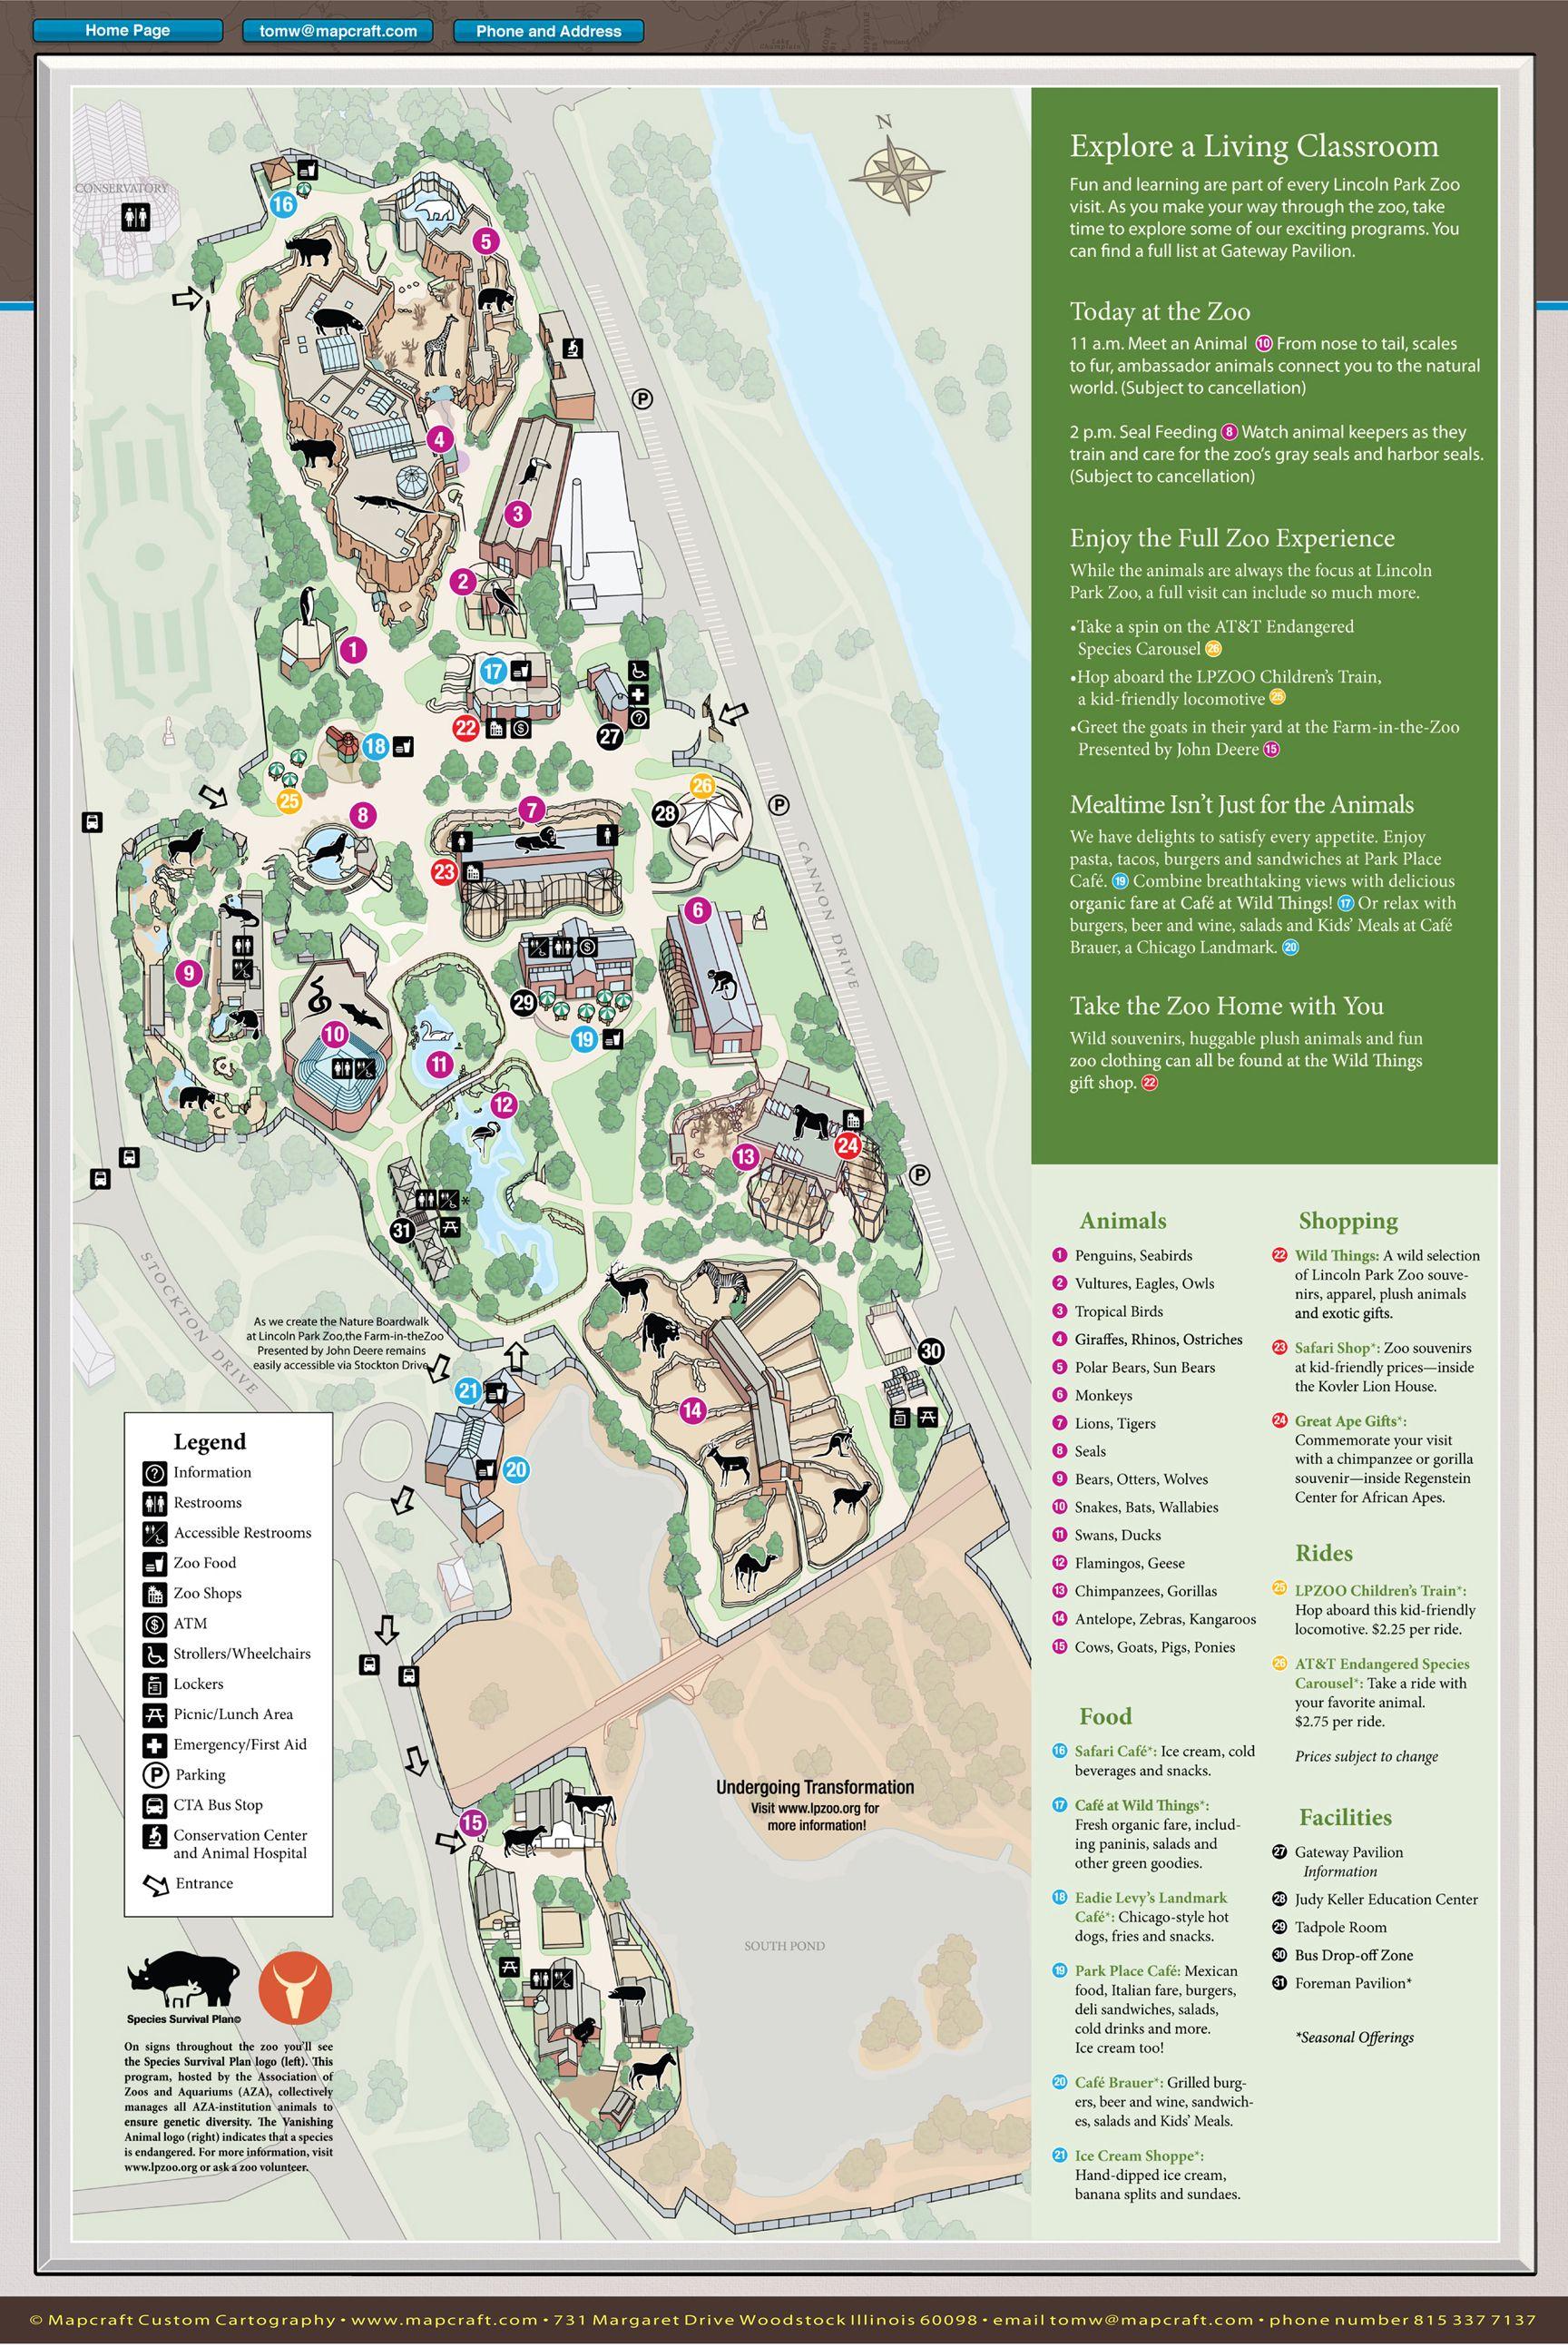 Mapcraft Custom Cartography Lincoln Park Zoo Lincoln Park Zoo Zoo Map Cartography